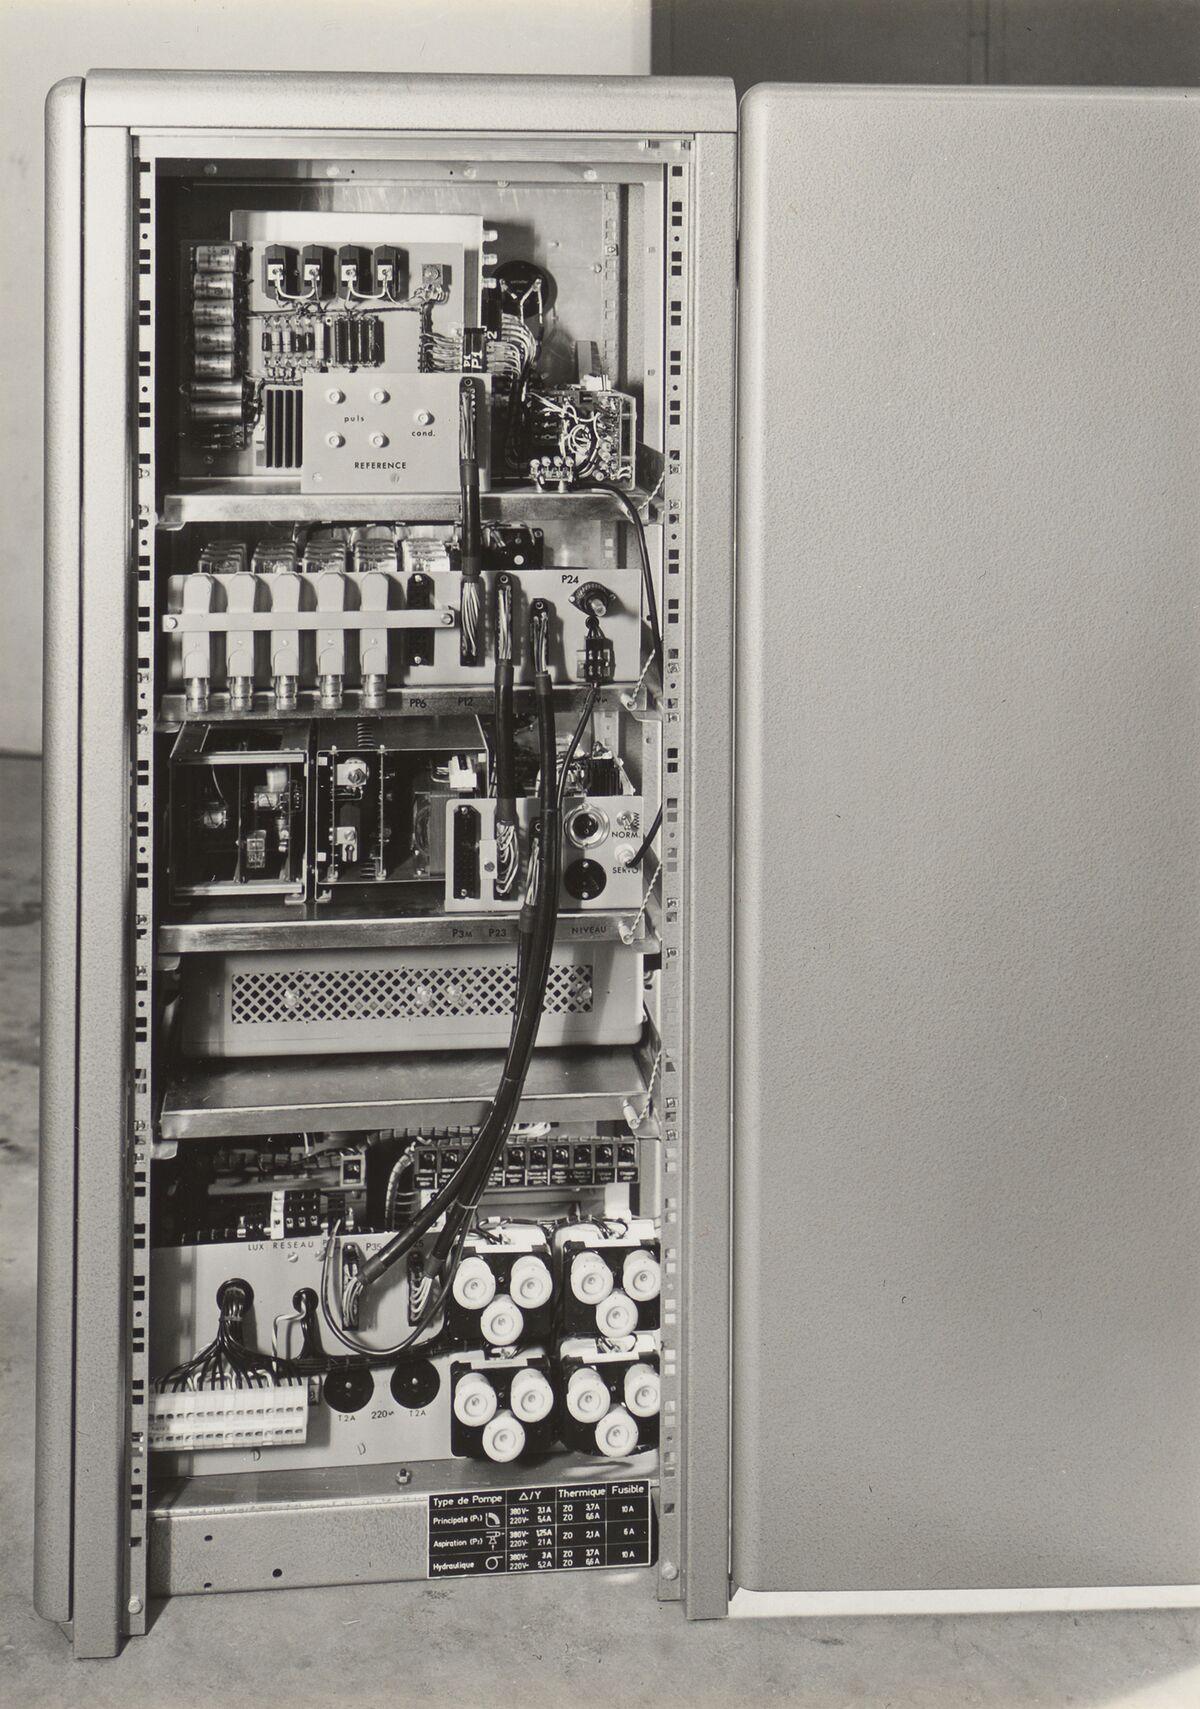 GFA 42/31005: Control box